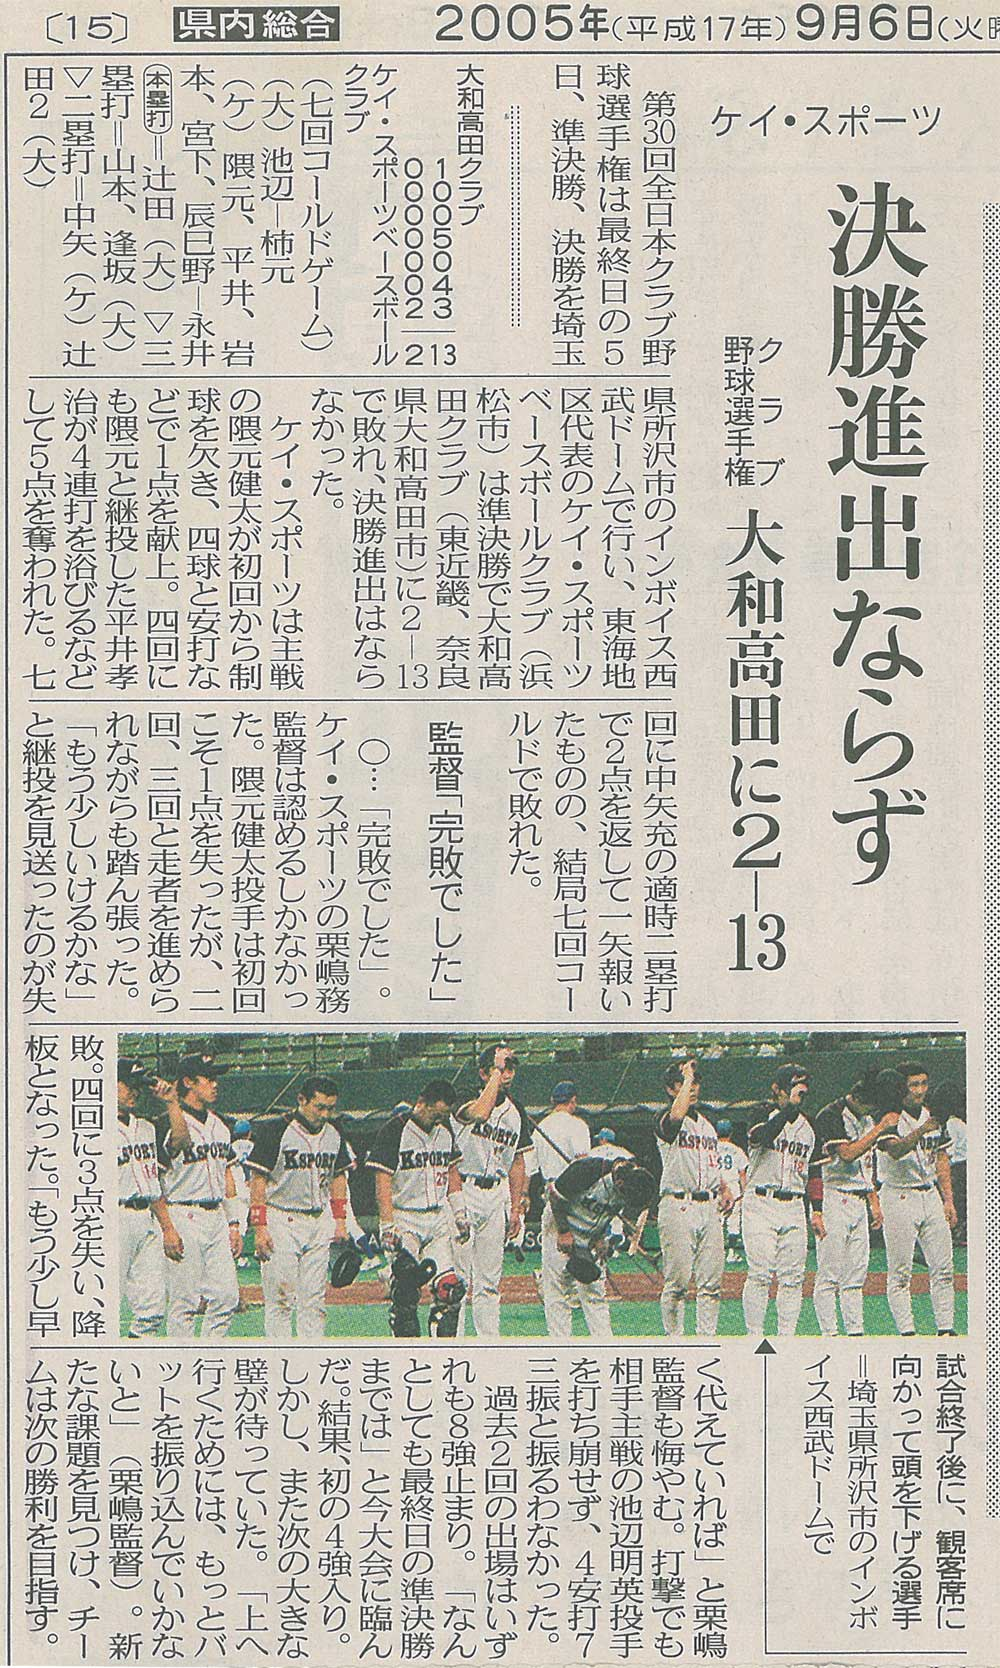 第30回全日本クラブ野球選手権大会